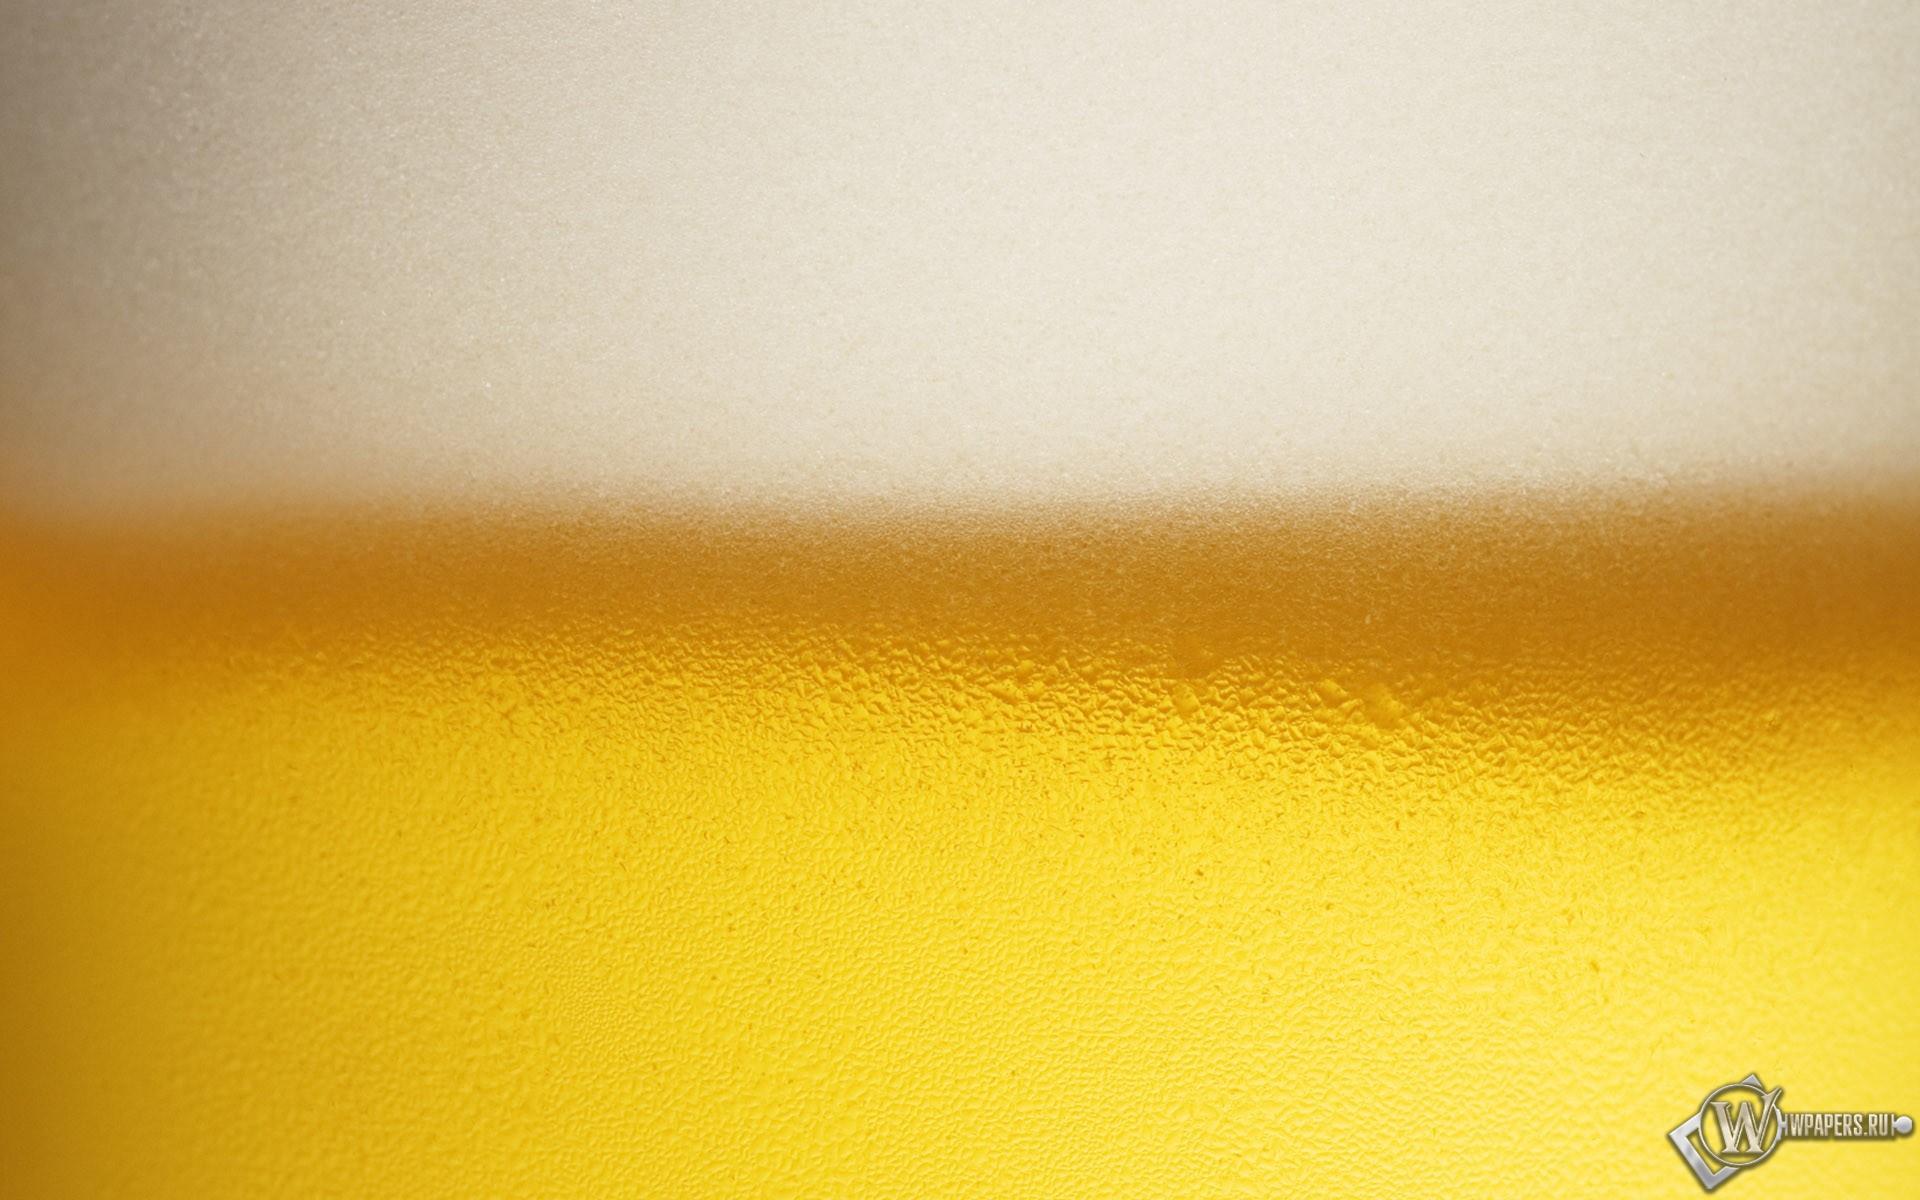 Пенное пиво 1920x1200